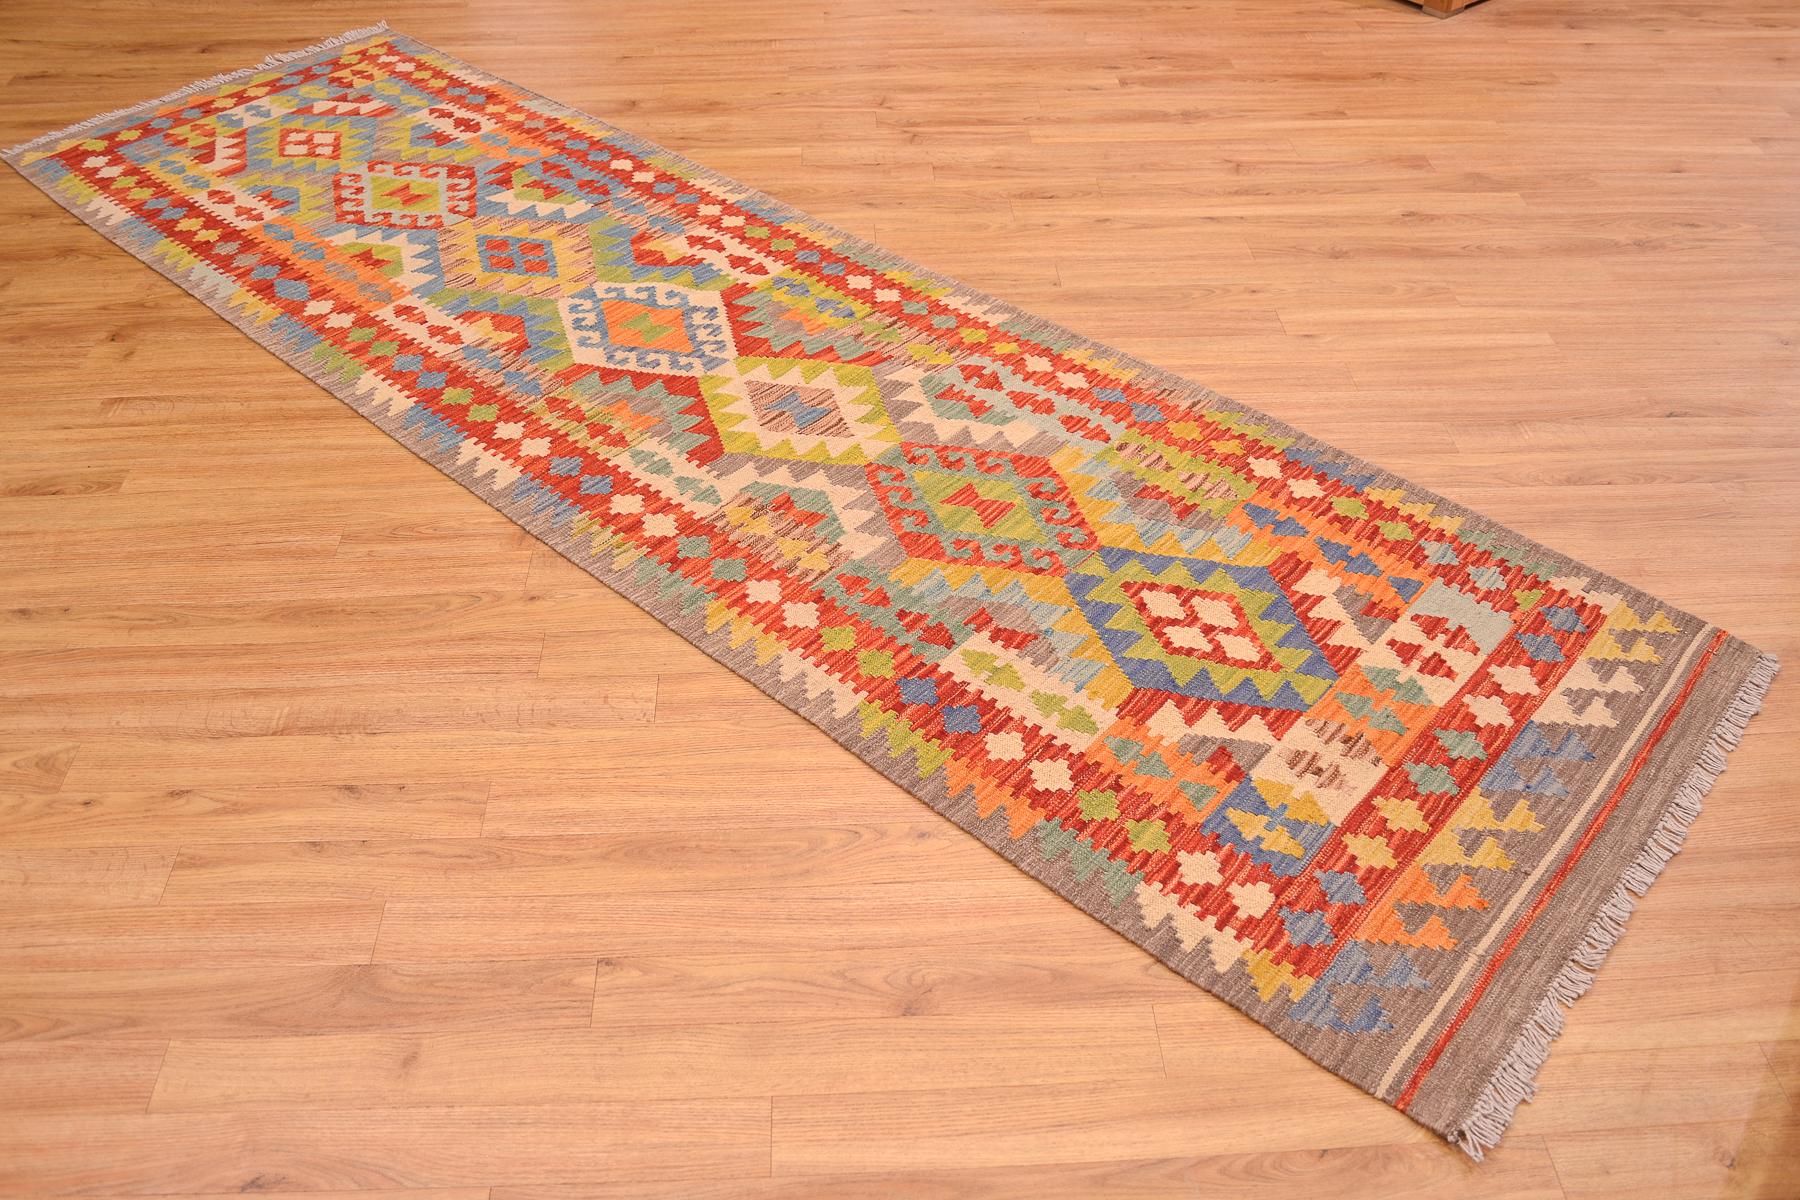 Afghan Veg Dye Kilim Runner 2 89x0 83m The Oriental Rug